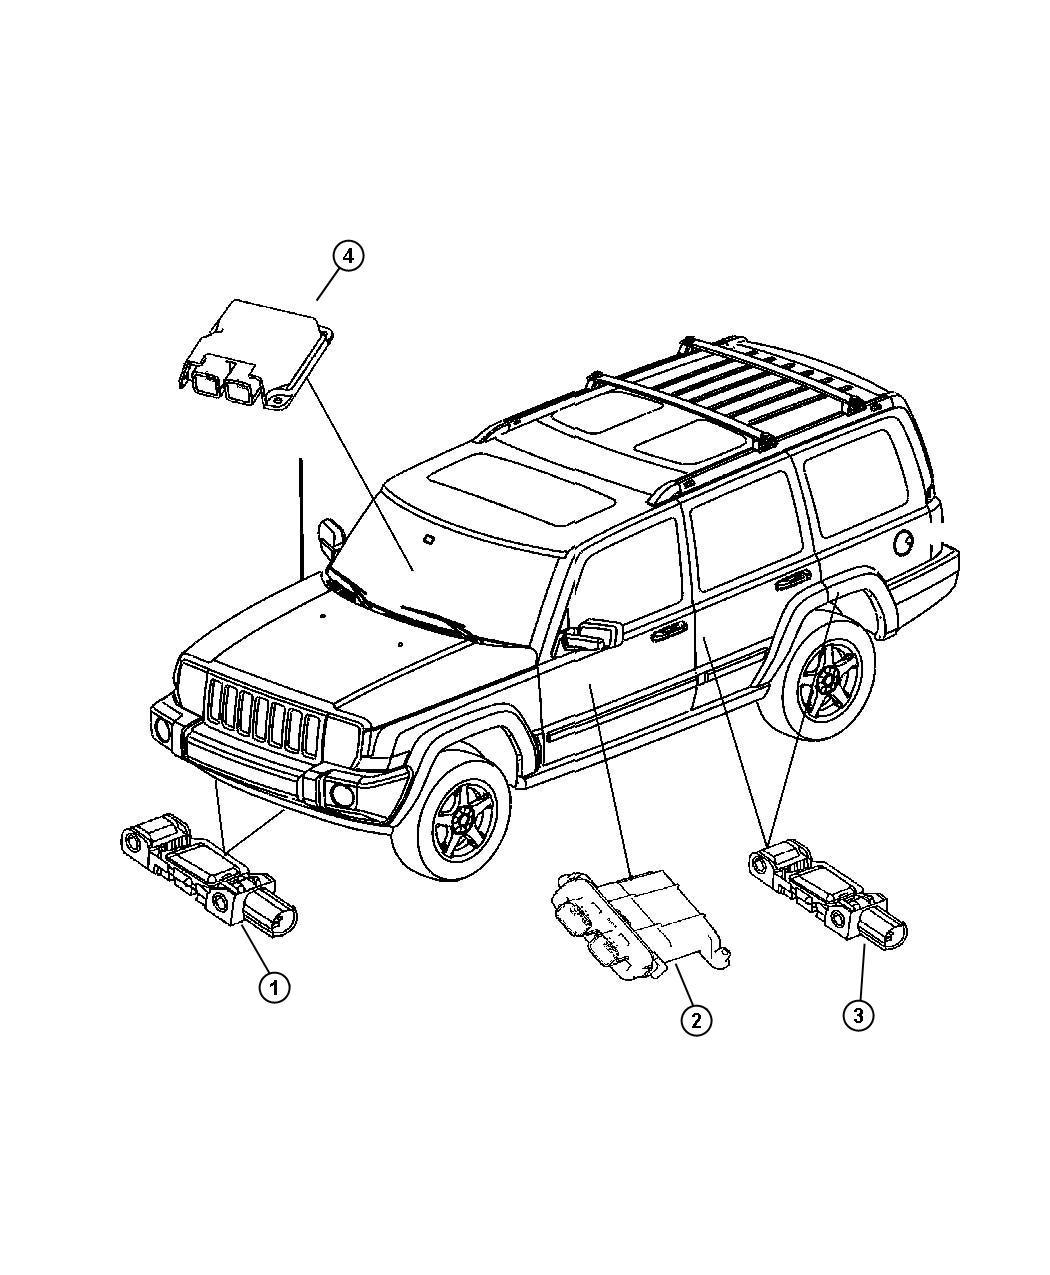 Jeep Wrangler Sensor. Air bag, impact, side airbag impact